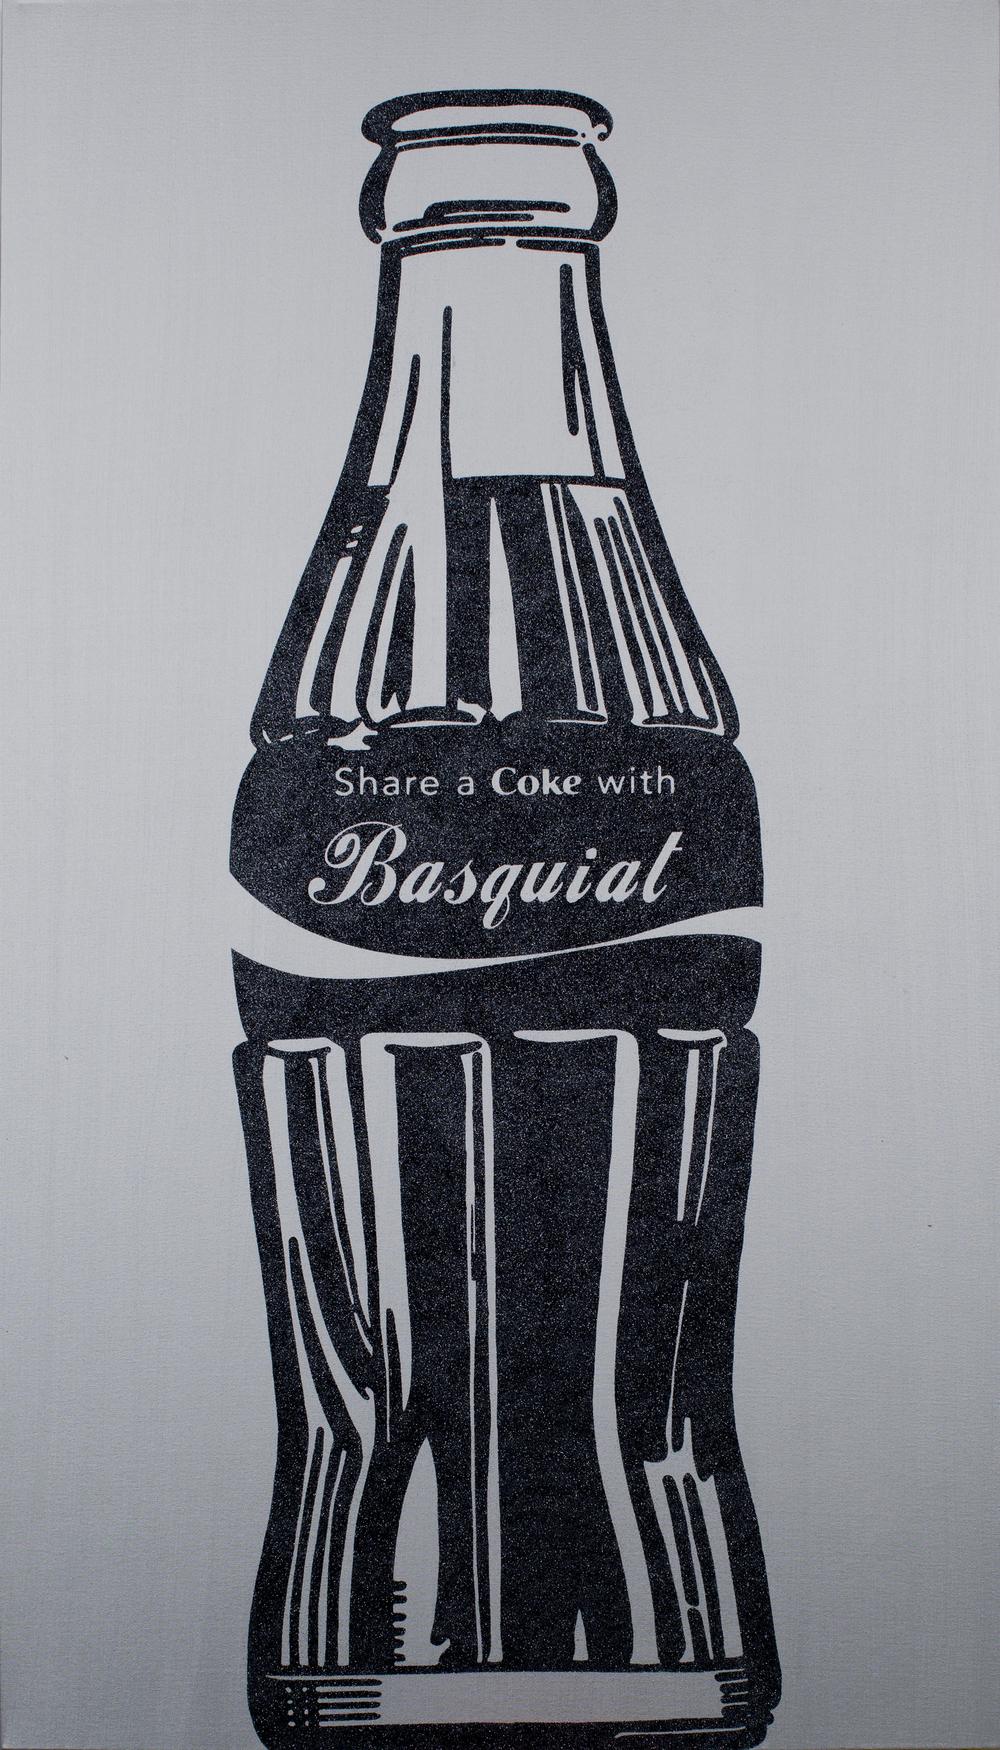 Share A Coke Basquiat Silver.jpg